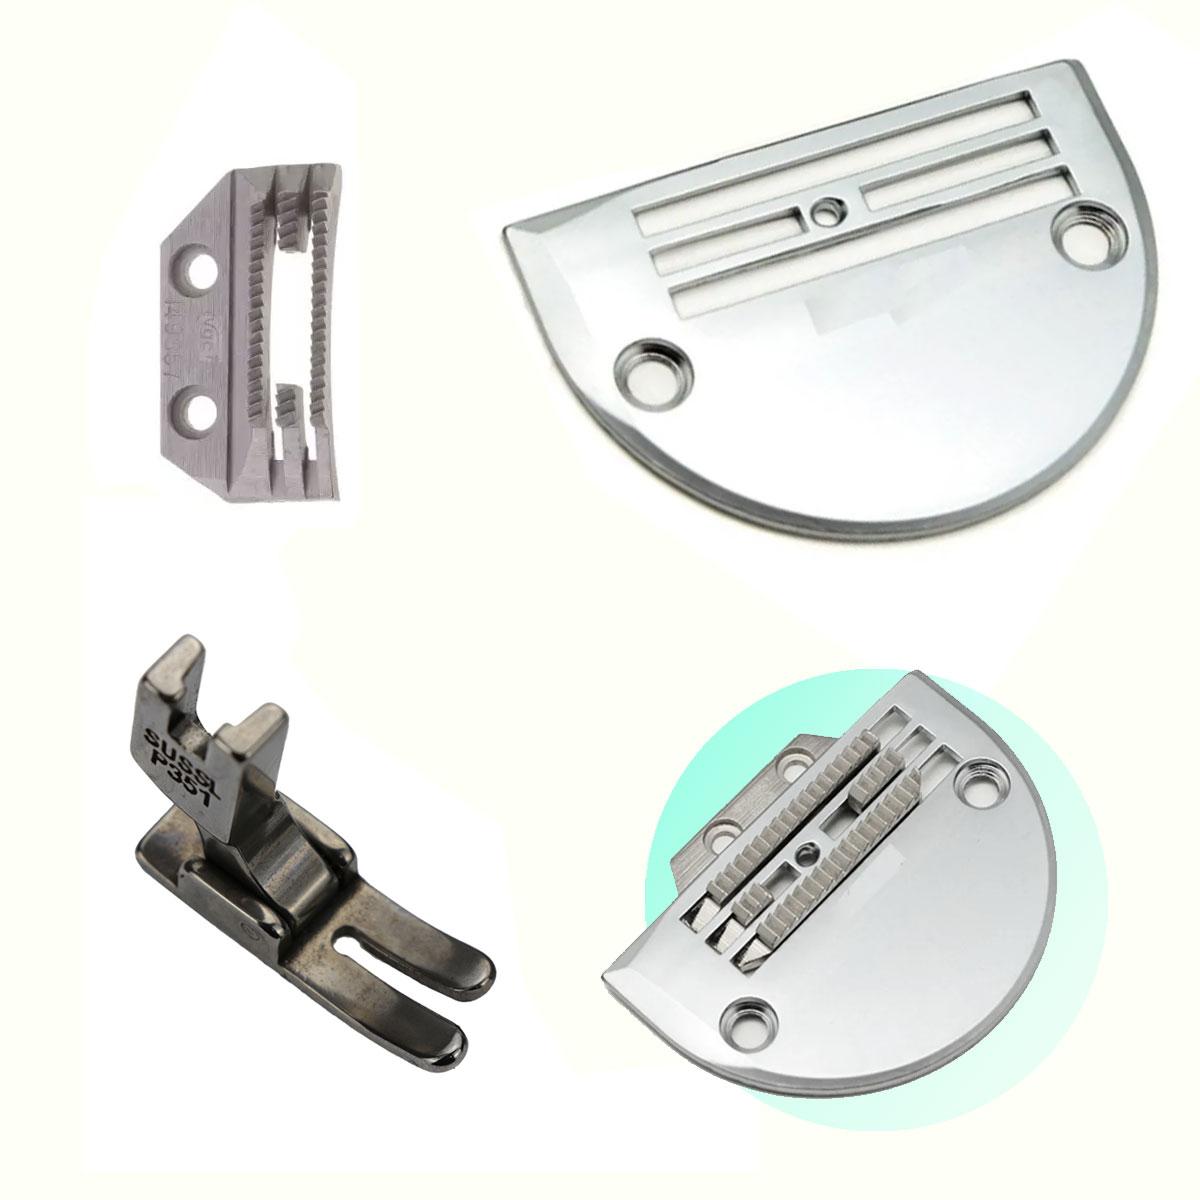 Chapa Dente E Calcador 4 Carreiras Industrial Costura Pesada